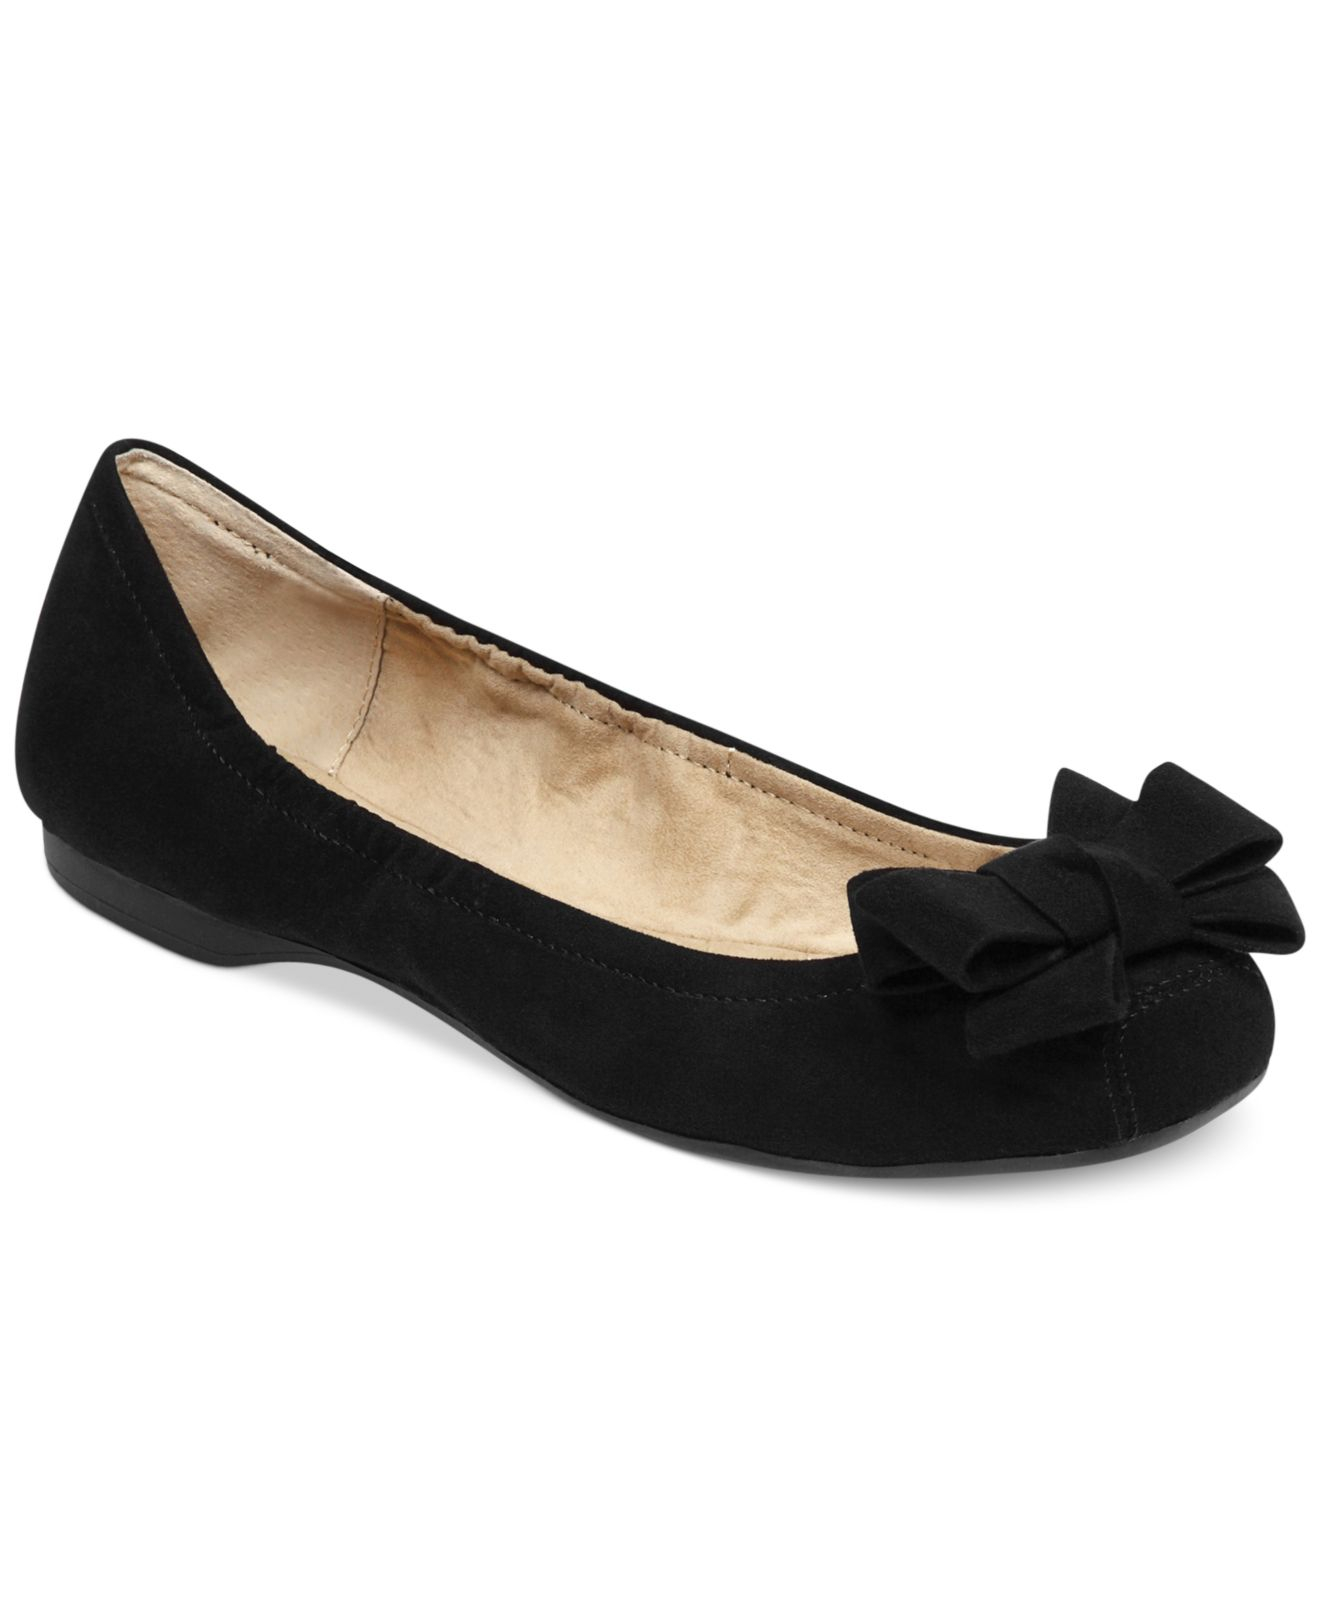 bdc8179361b2 Lyst - Jessica Simpson Milee Bow Flats in Black